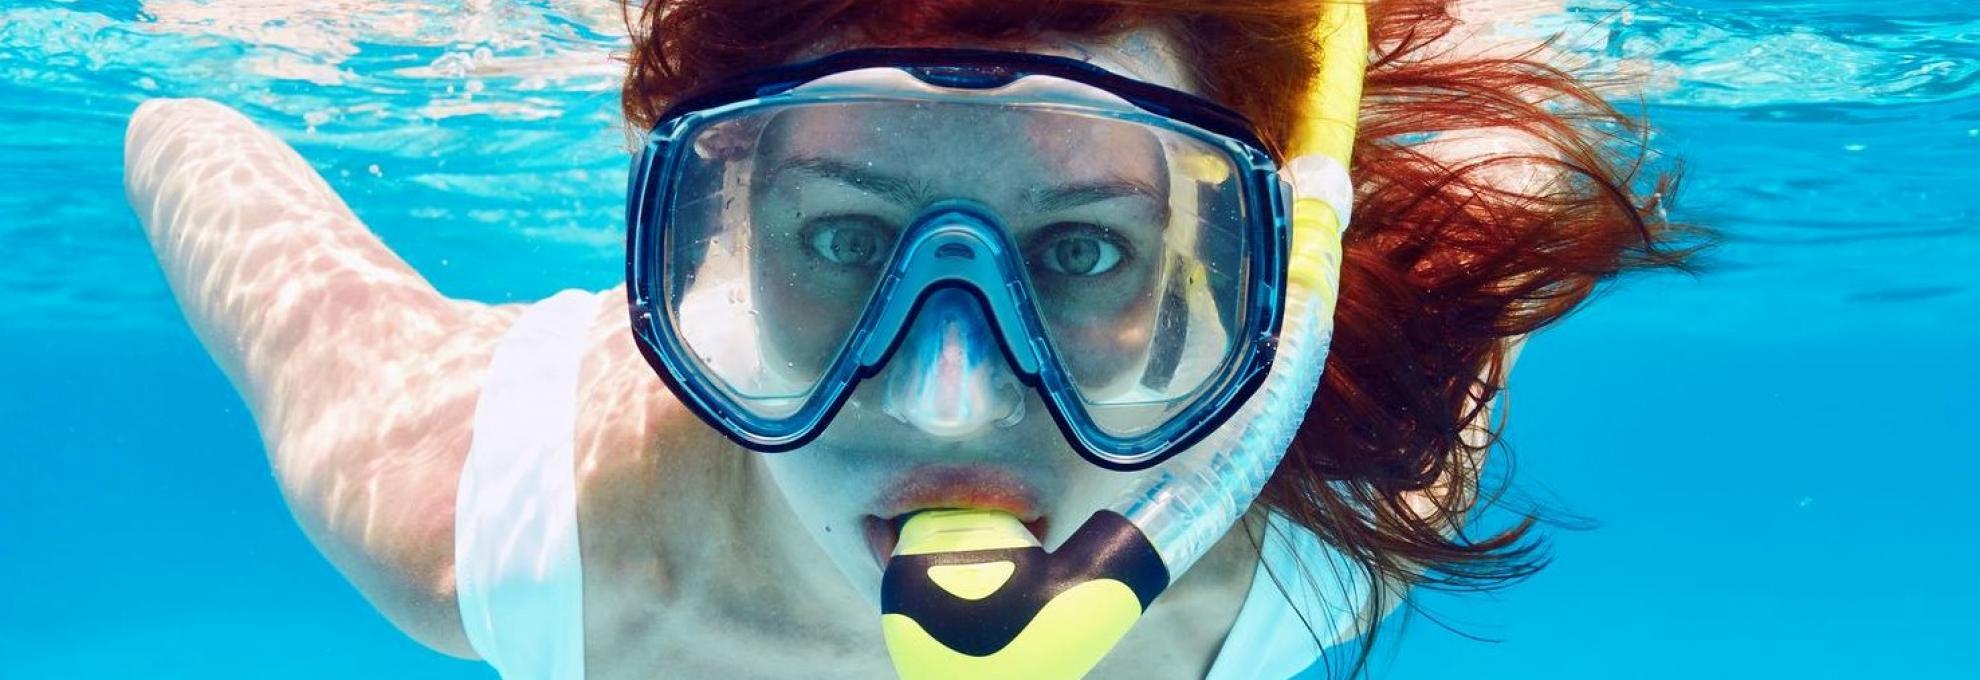 Snorkeling all'Isola bella